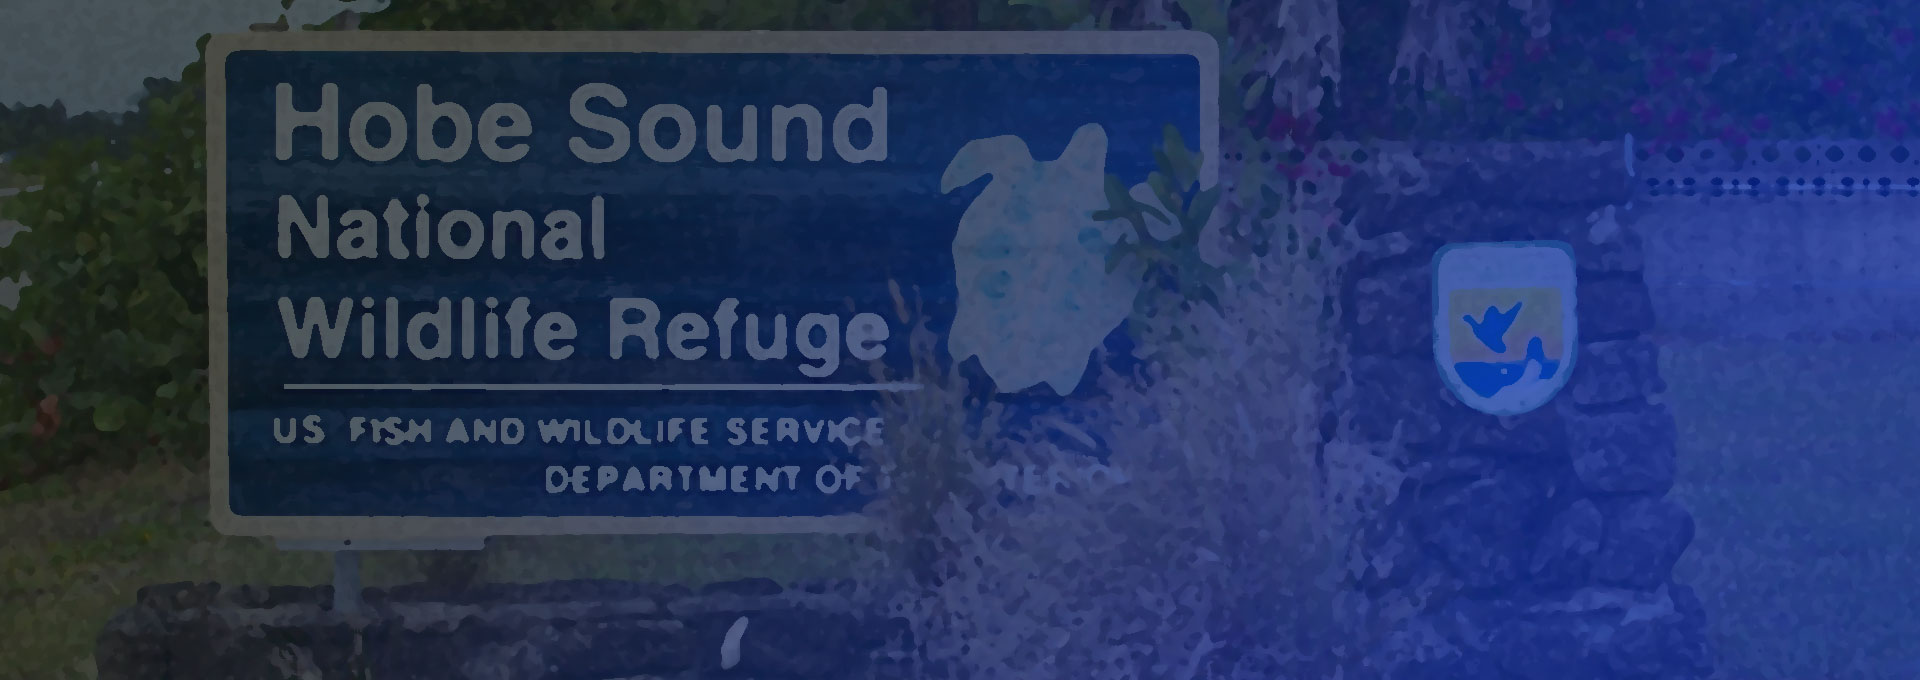 hobe sound sign